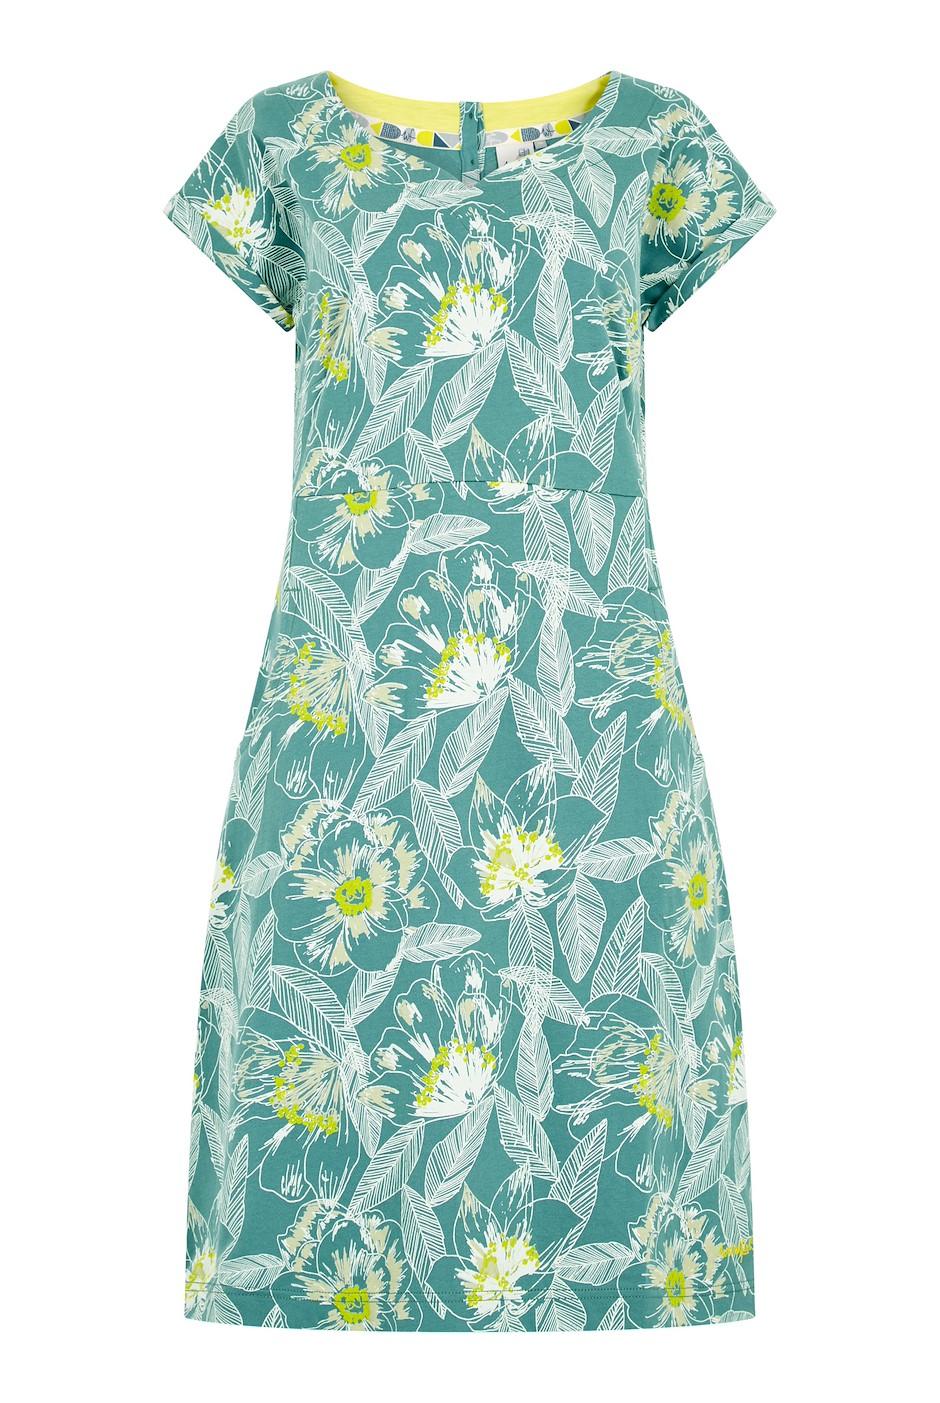 Biscayne Printed Jersey Dress Viridis